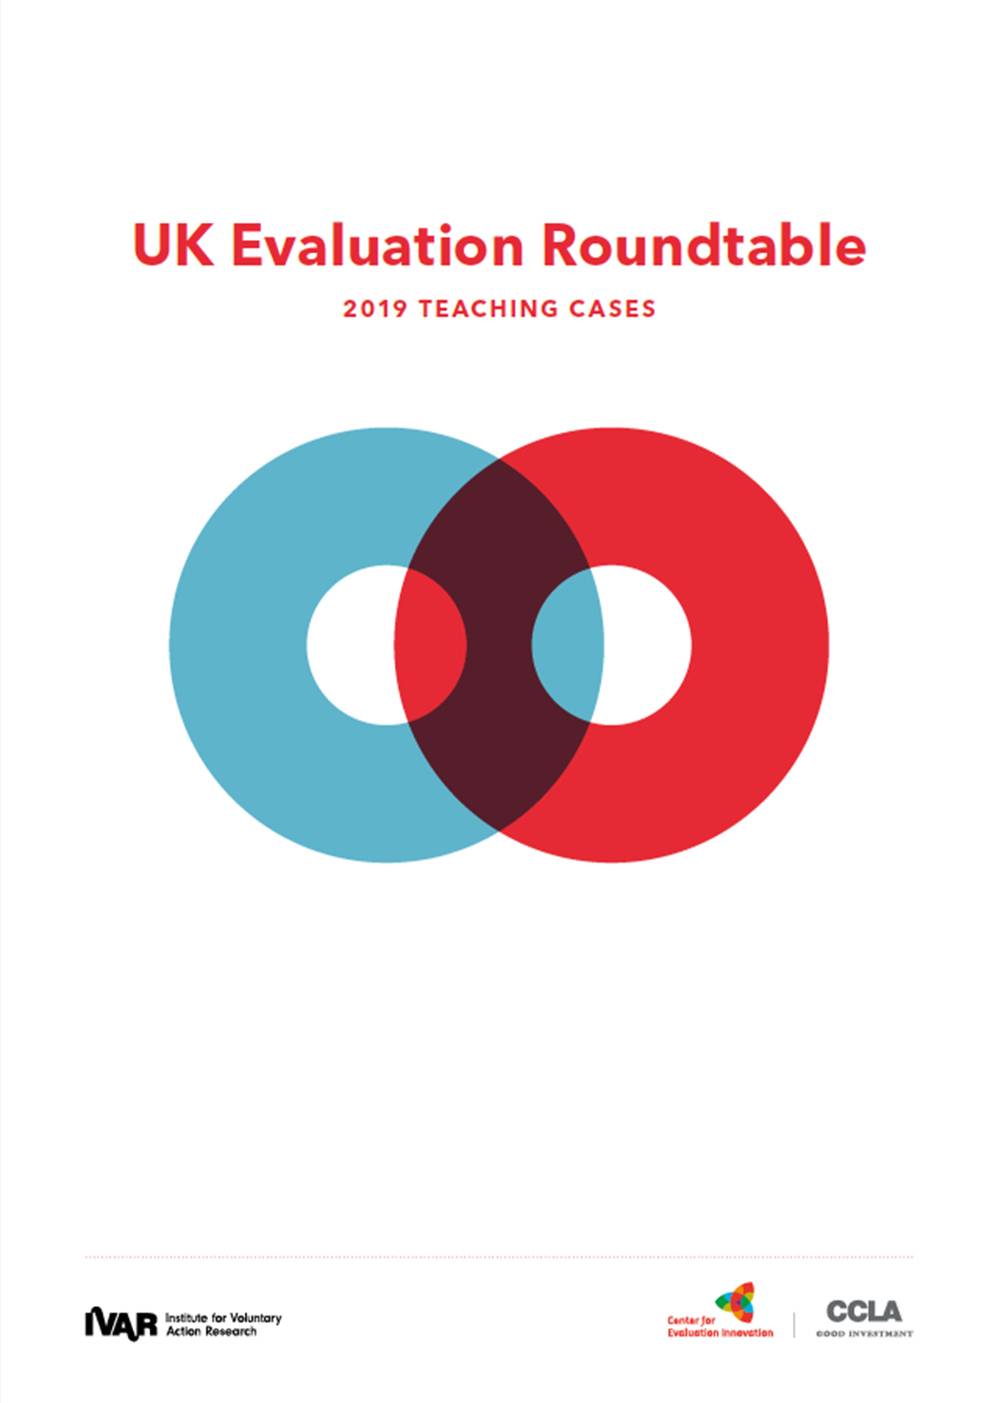 UK Evaluation Roundtable Teaching Cases 2019